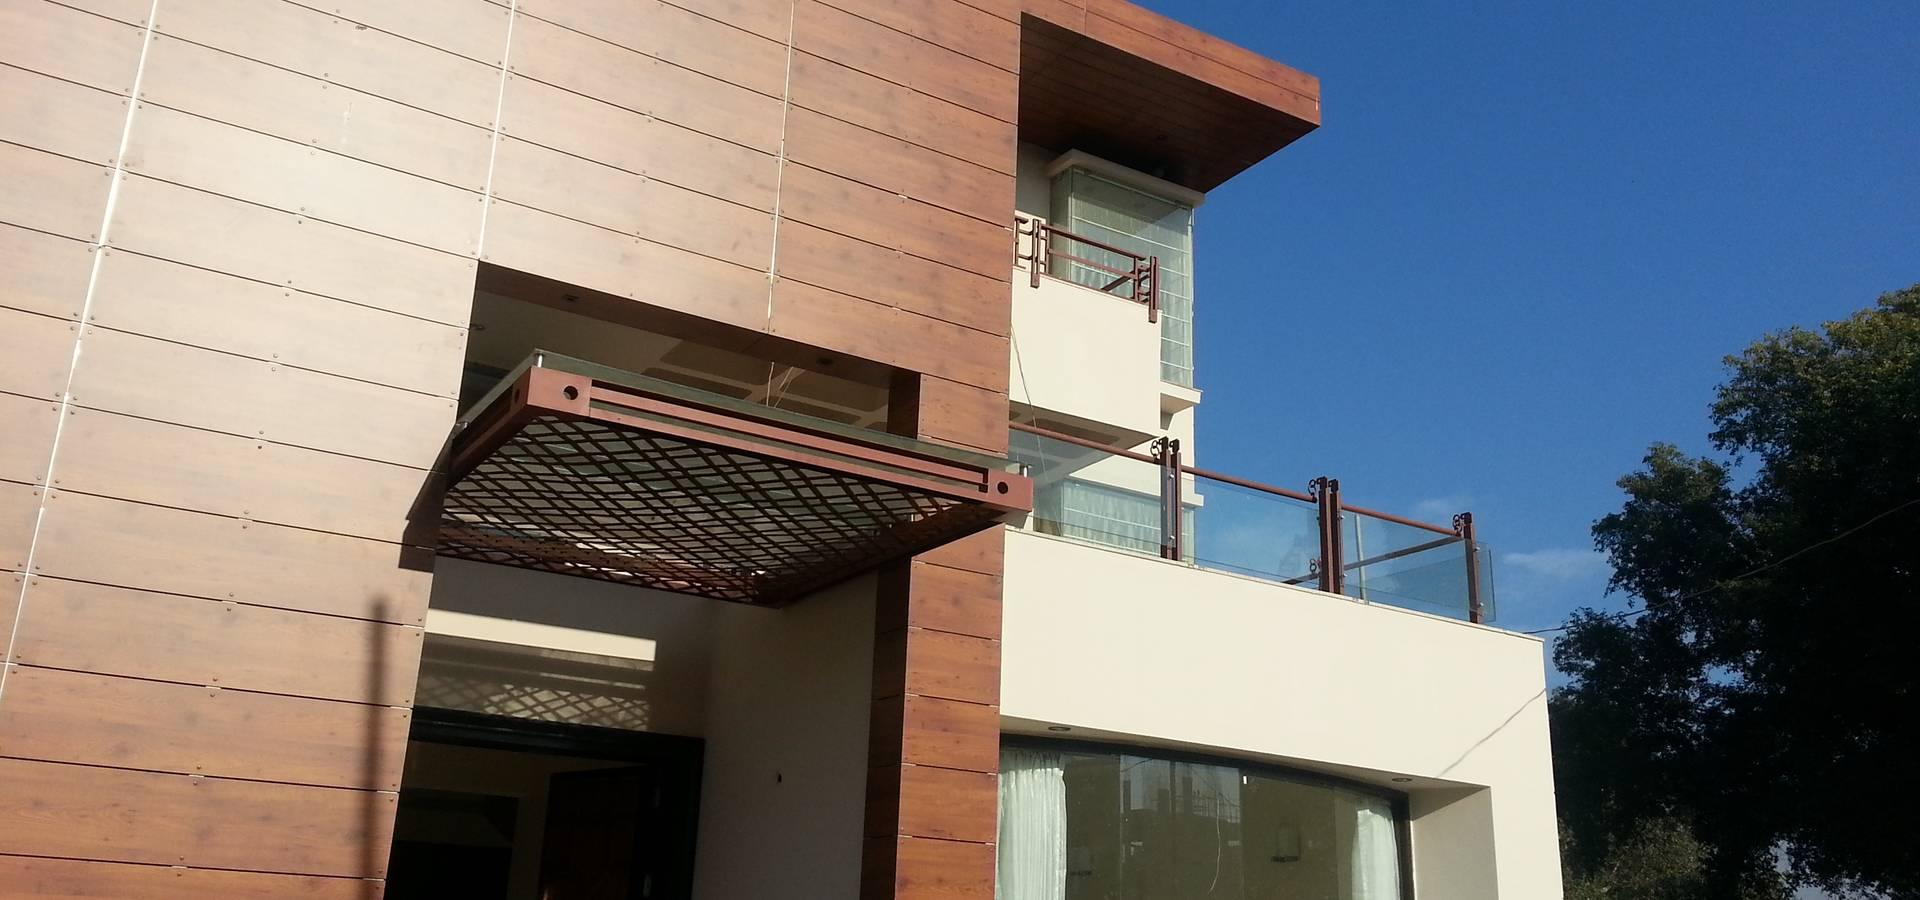 NOOR Architects Consultants